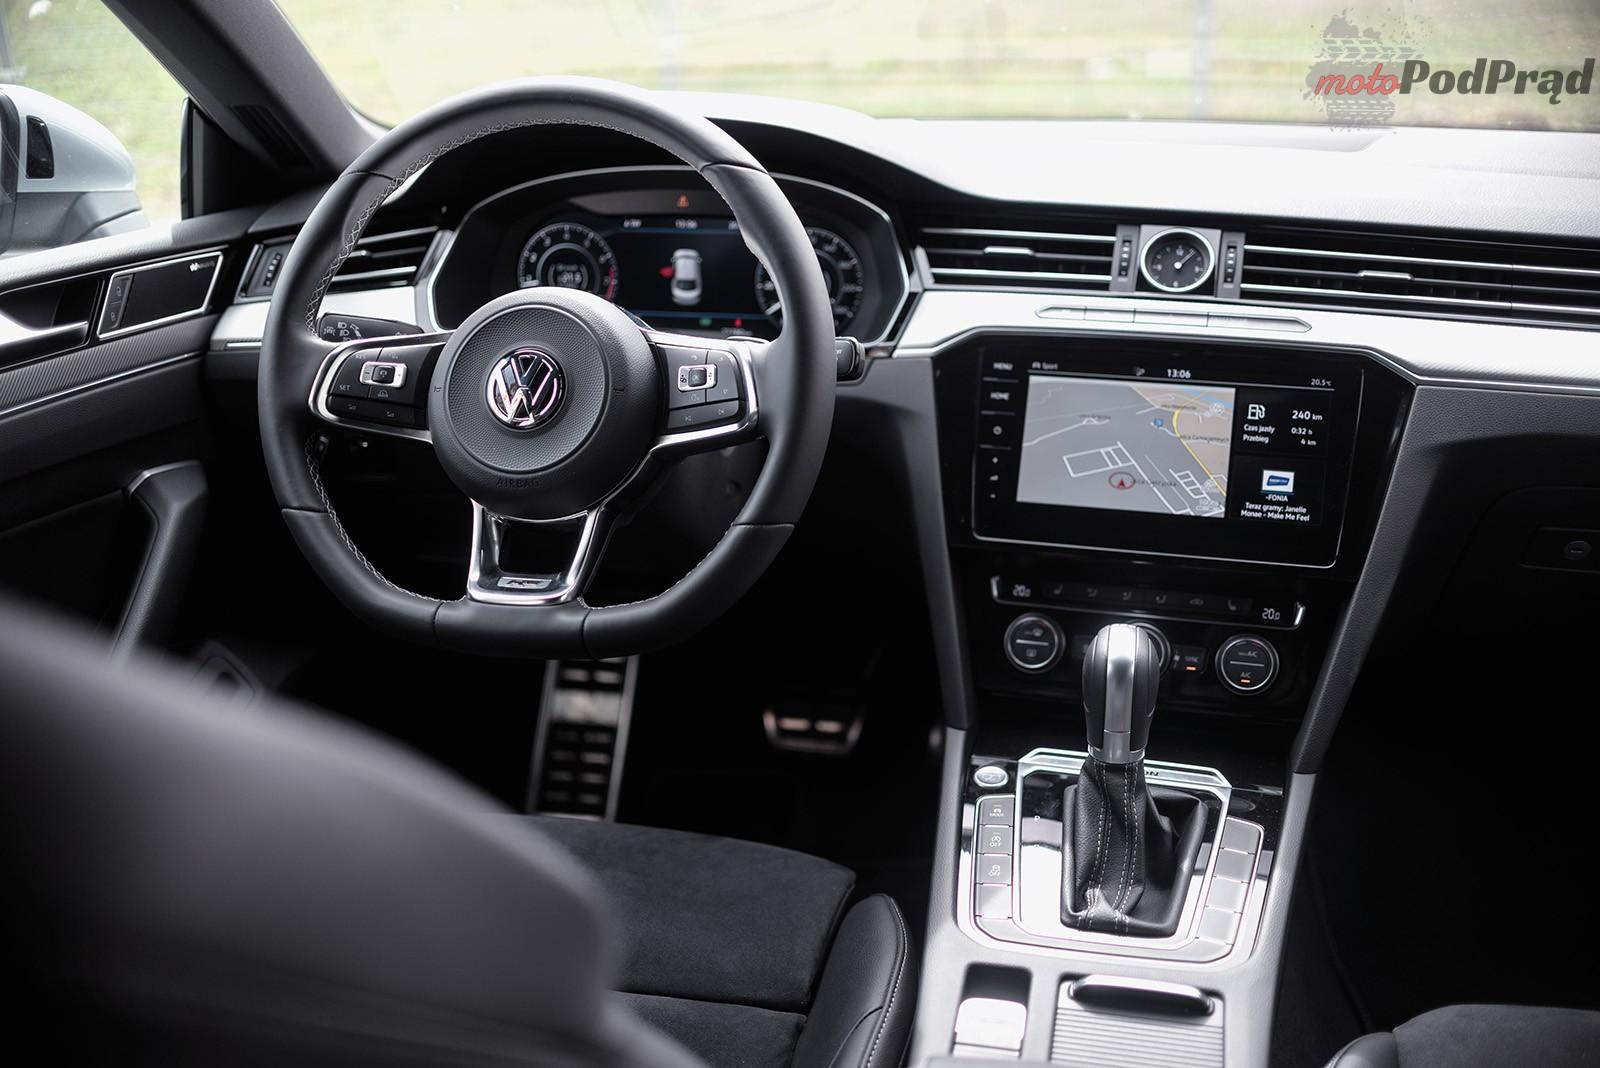 Volkswagen Arteon37 Test: Volkswagen Arteon 2.0 TSI 280 KM   udana metamorfoza